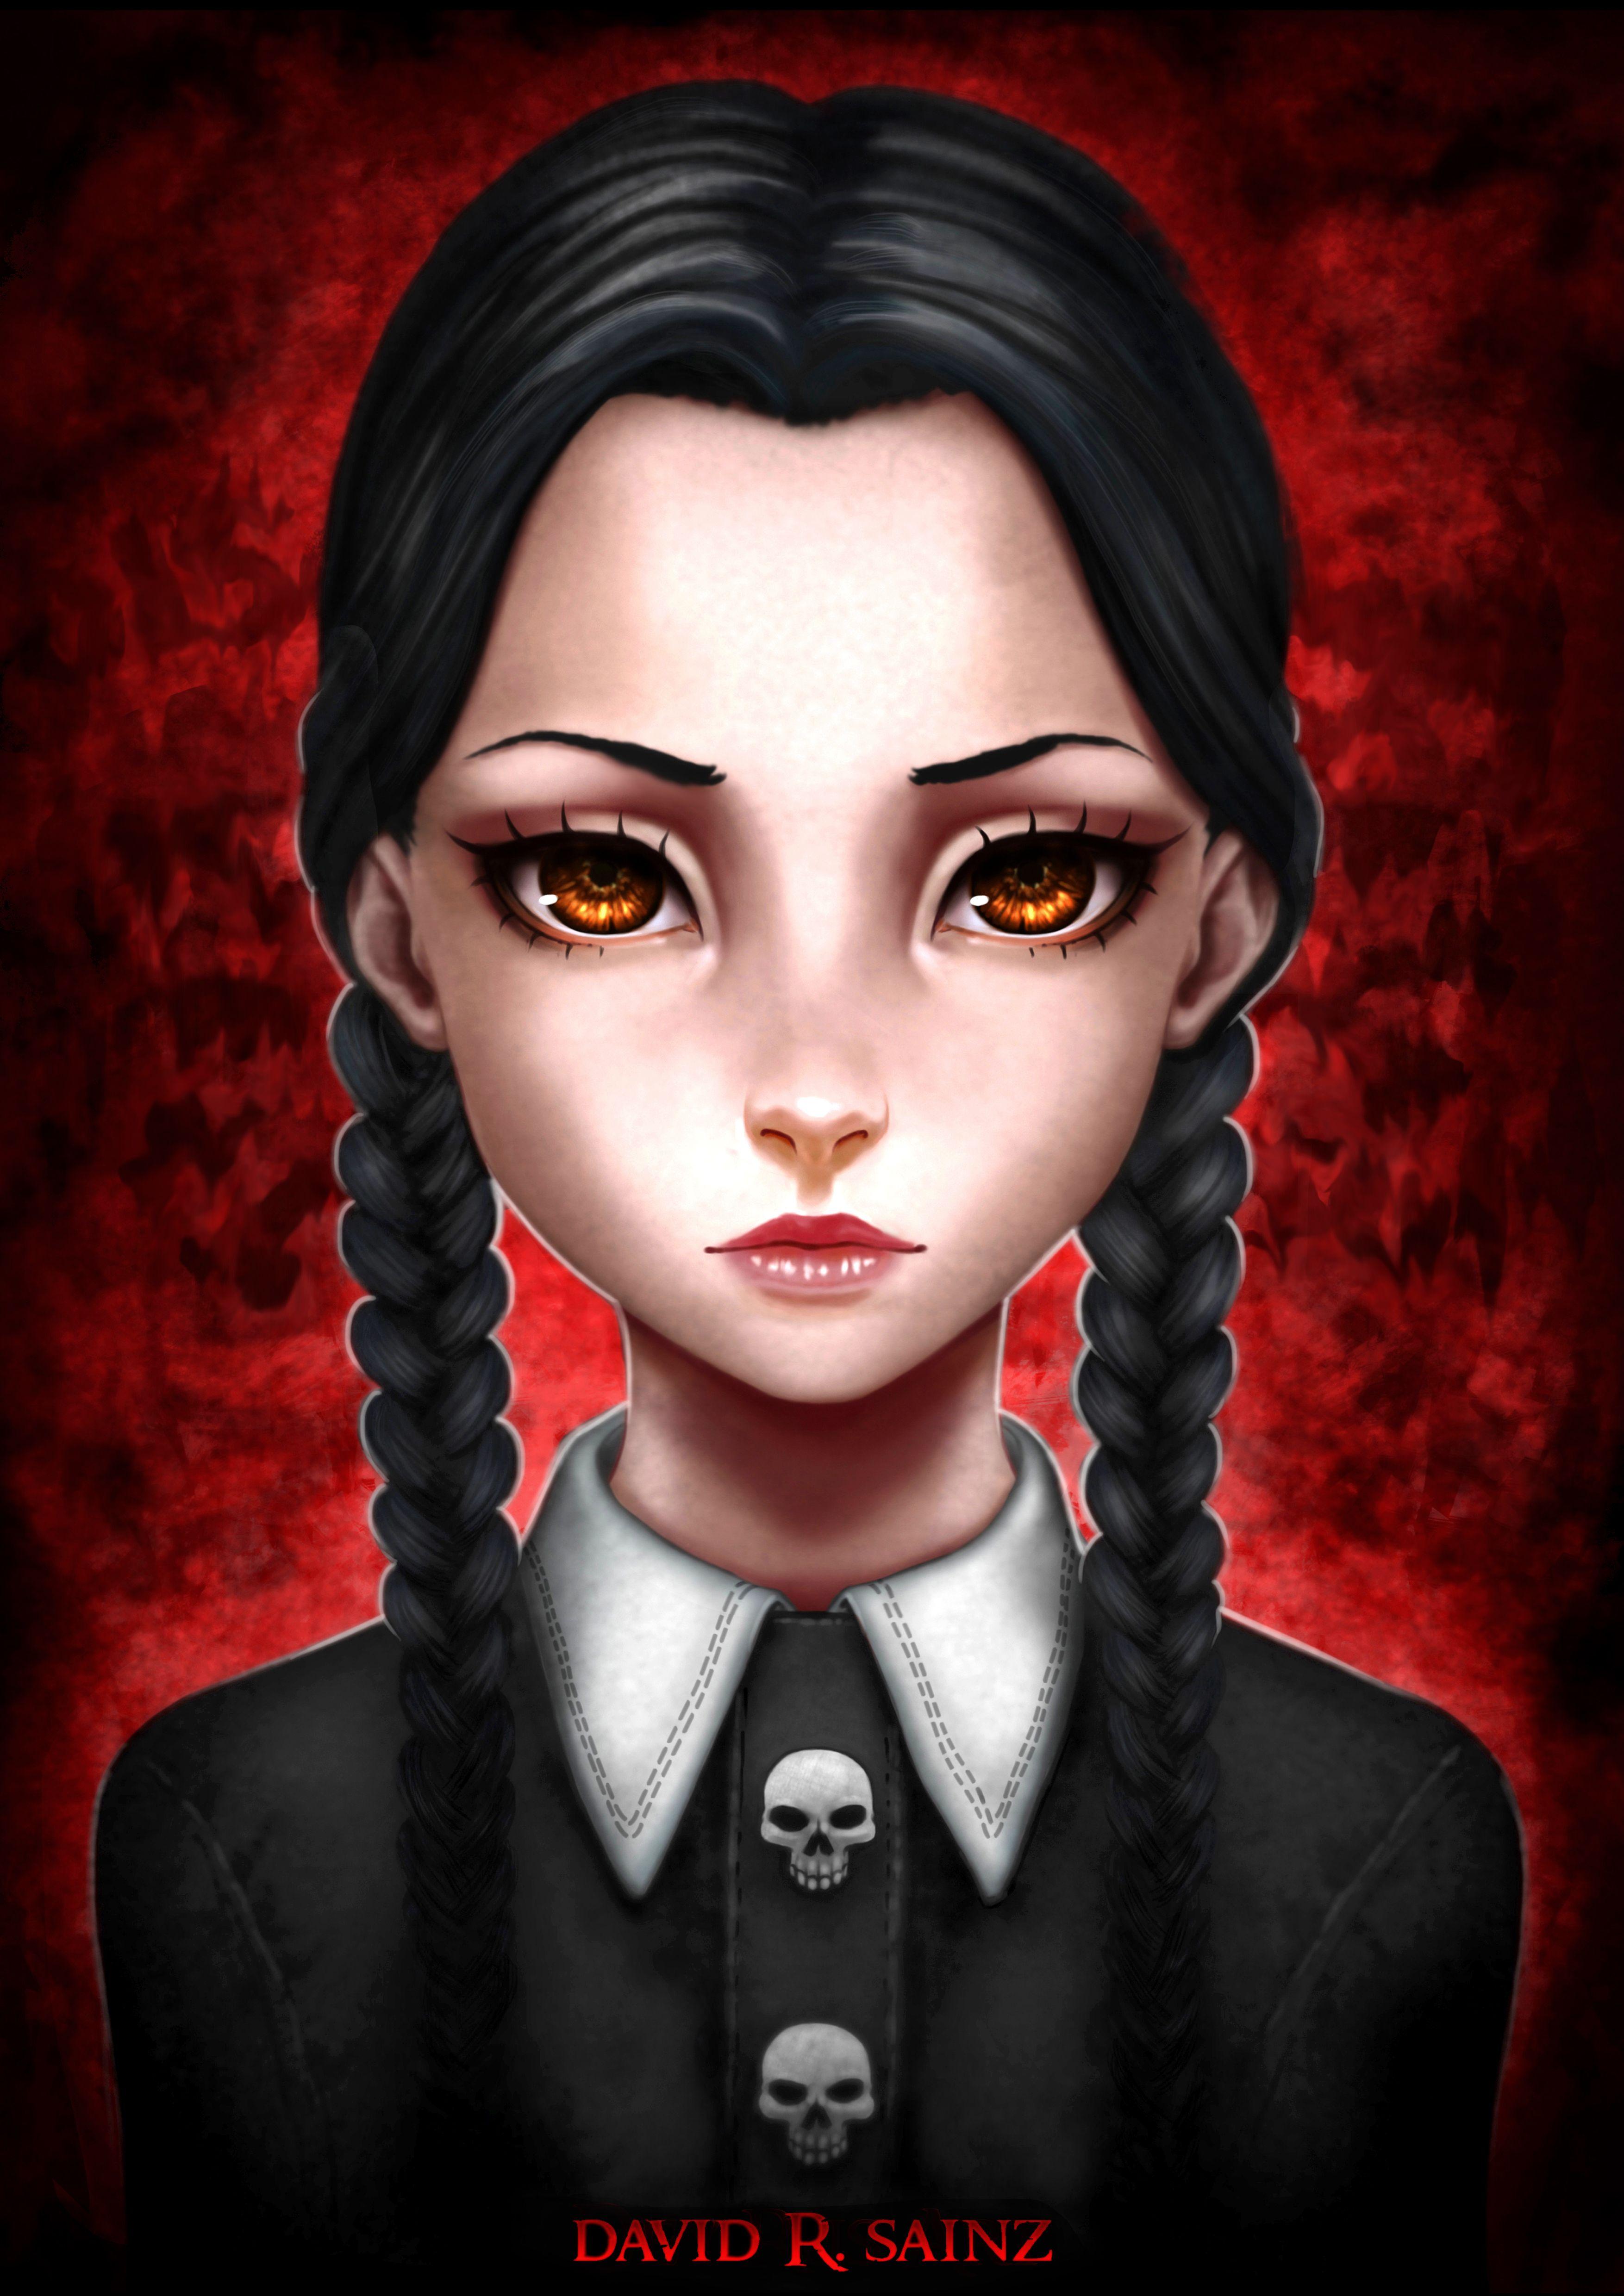 Addams Family Porn wednesday addams fanartdavid r.sainz | wednesday addams